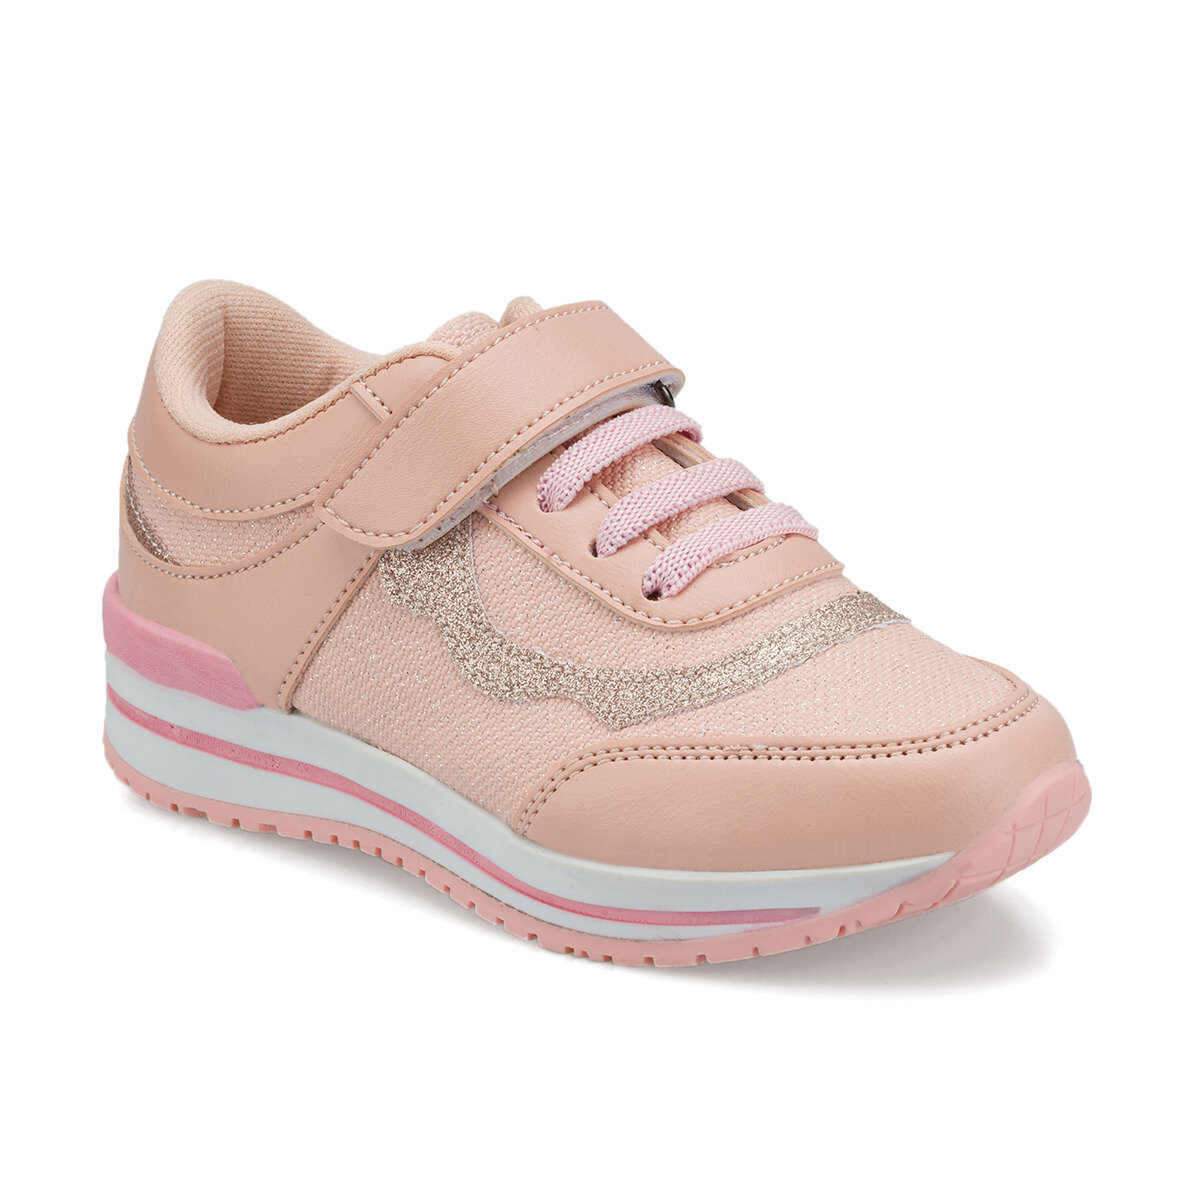 FLO 512297.P Pink Female Child Sports Shoes Polaris